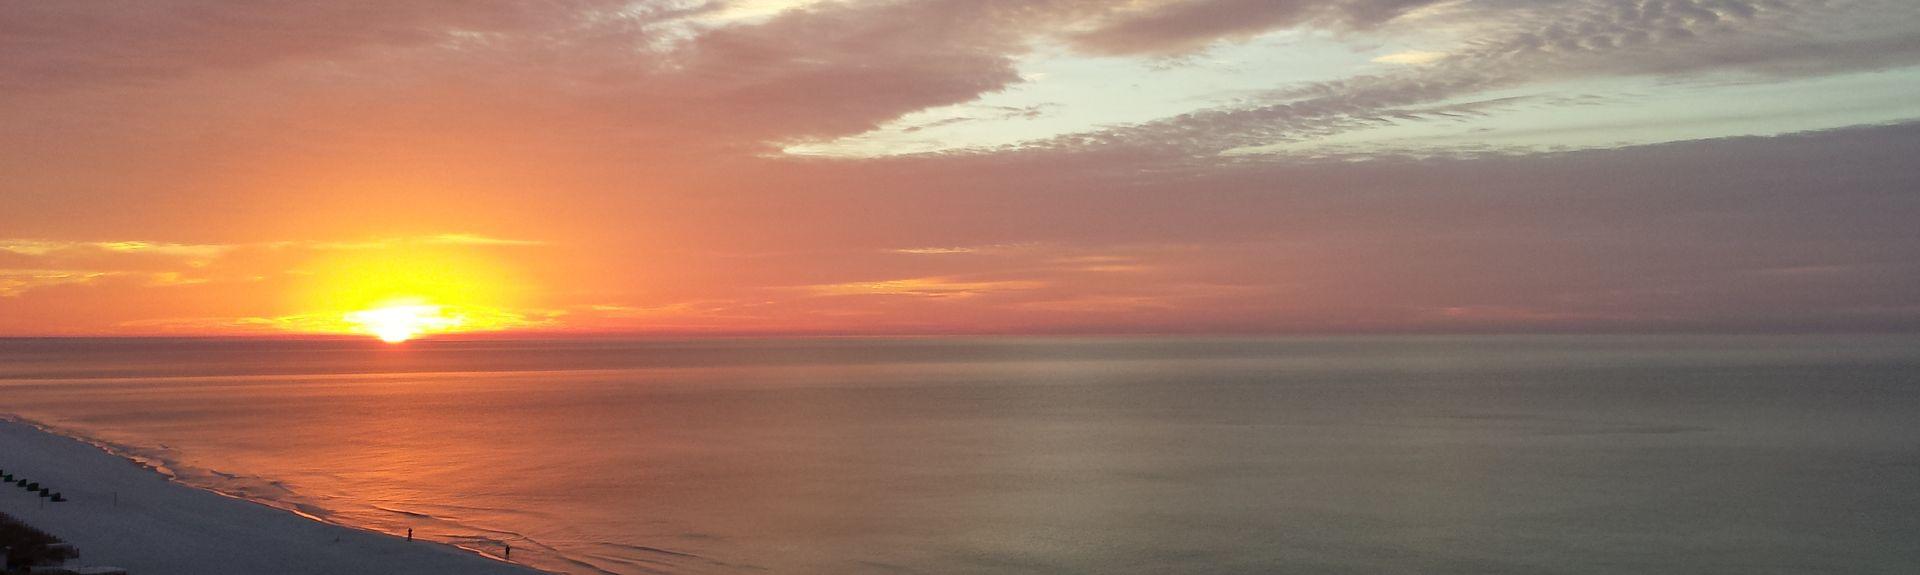 Emerald Waters, Miramar Beach, Florida, United States of America